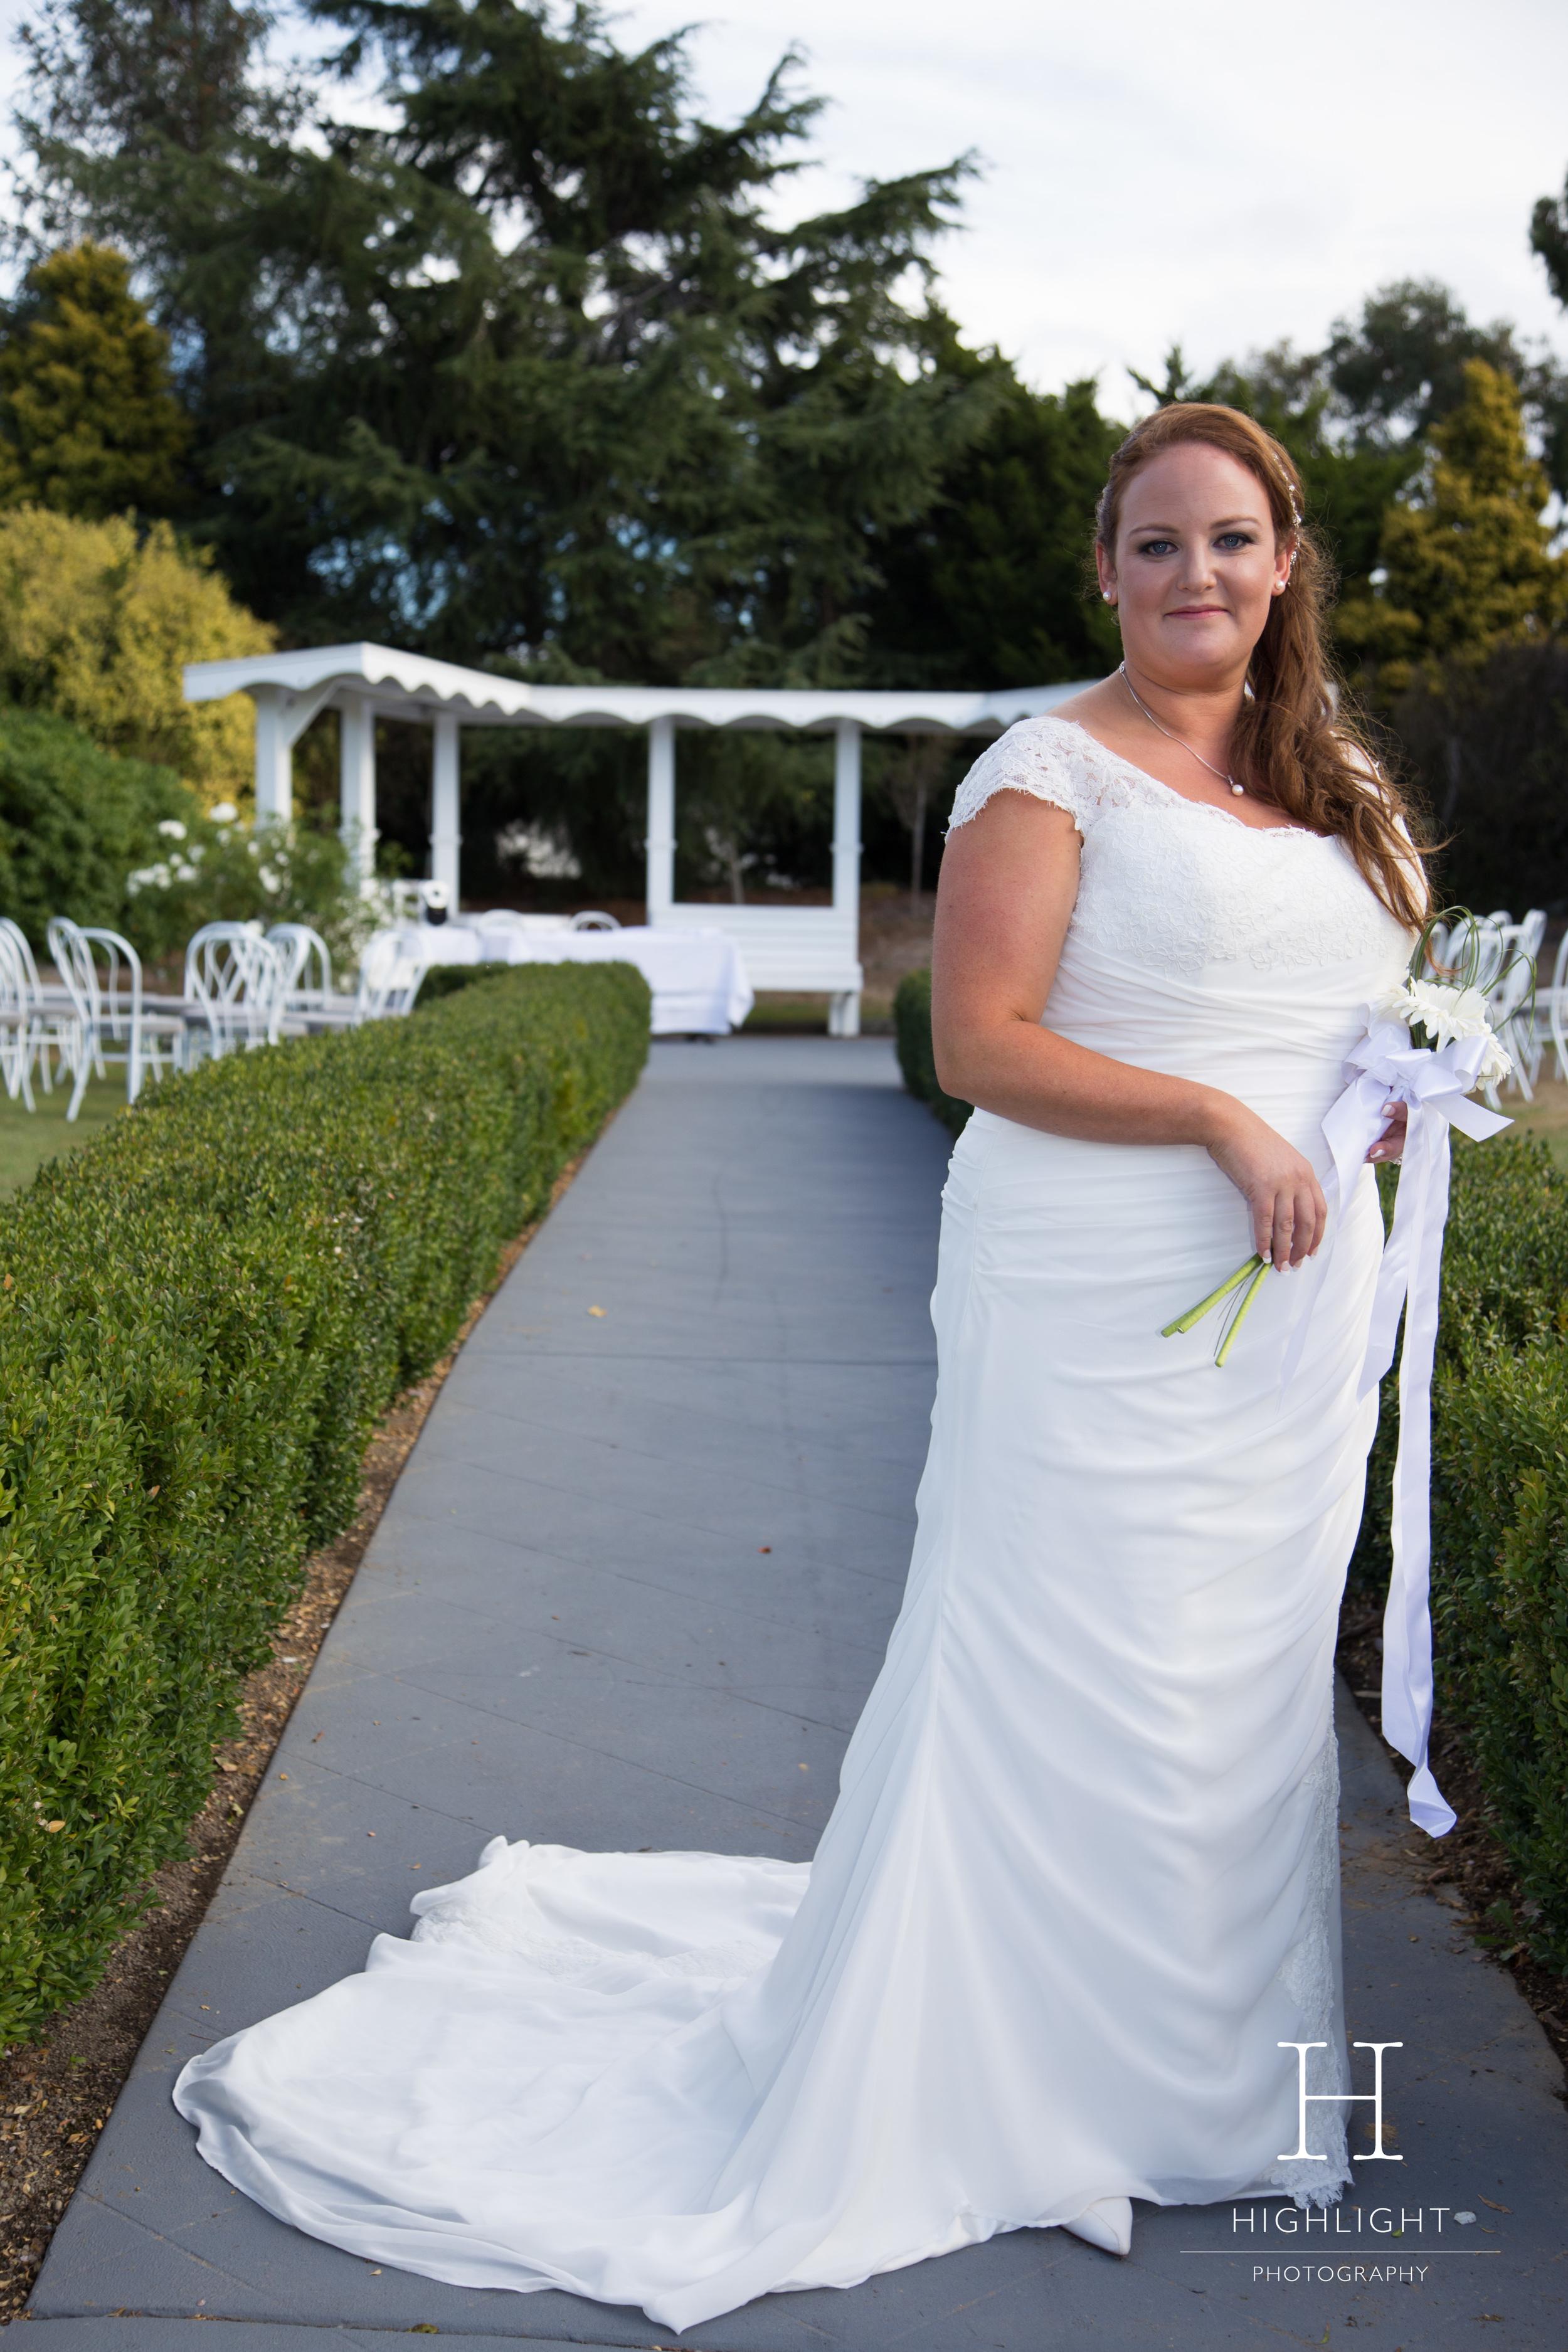 highlight-wedding-photography-palmerston-north.jpg